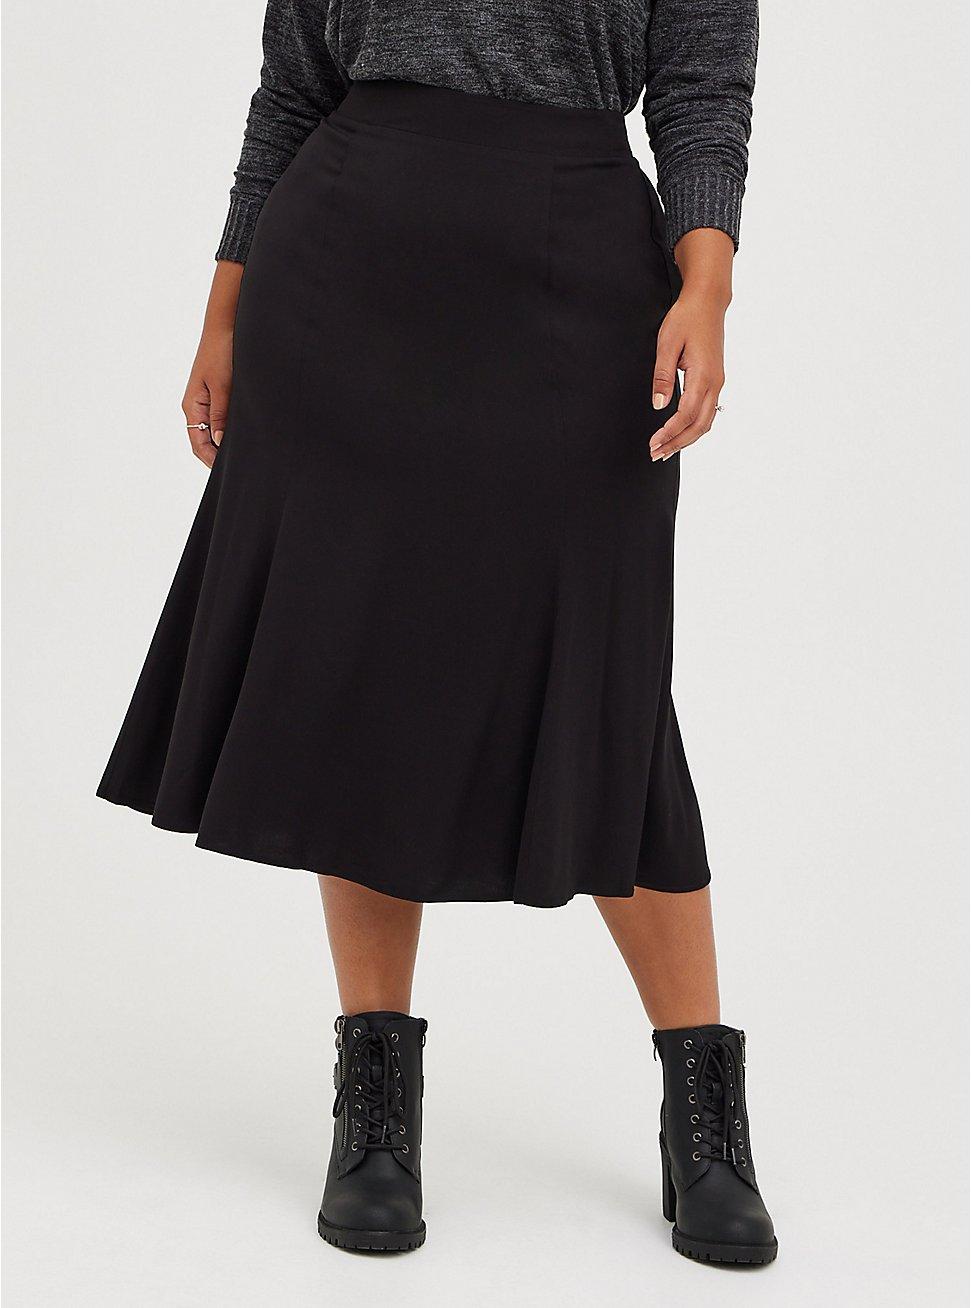 Plus Size Flared Midi Skirt - Challis Black, DEEP BLACK, hi-res